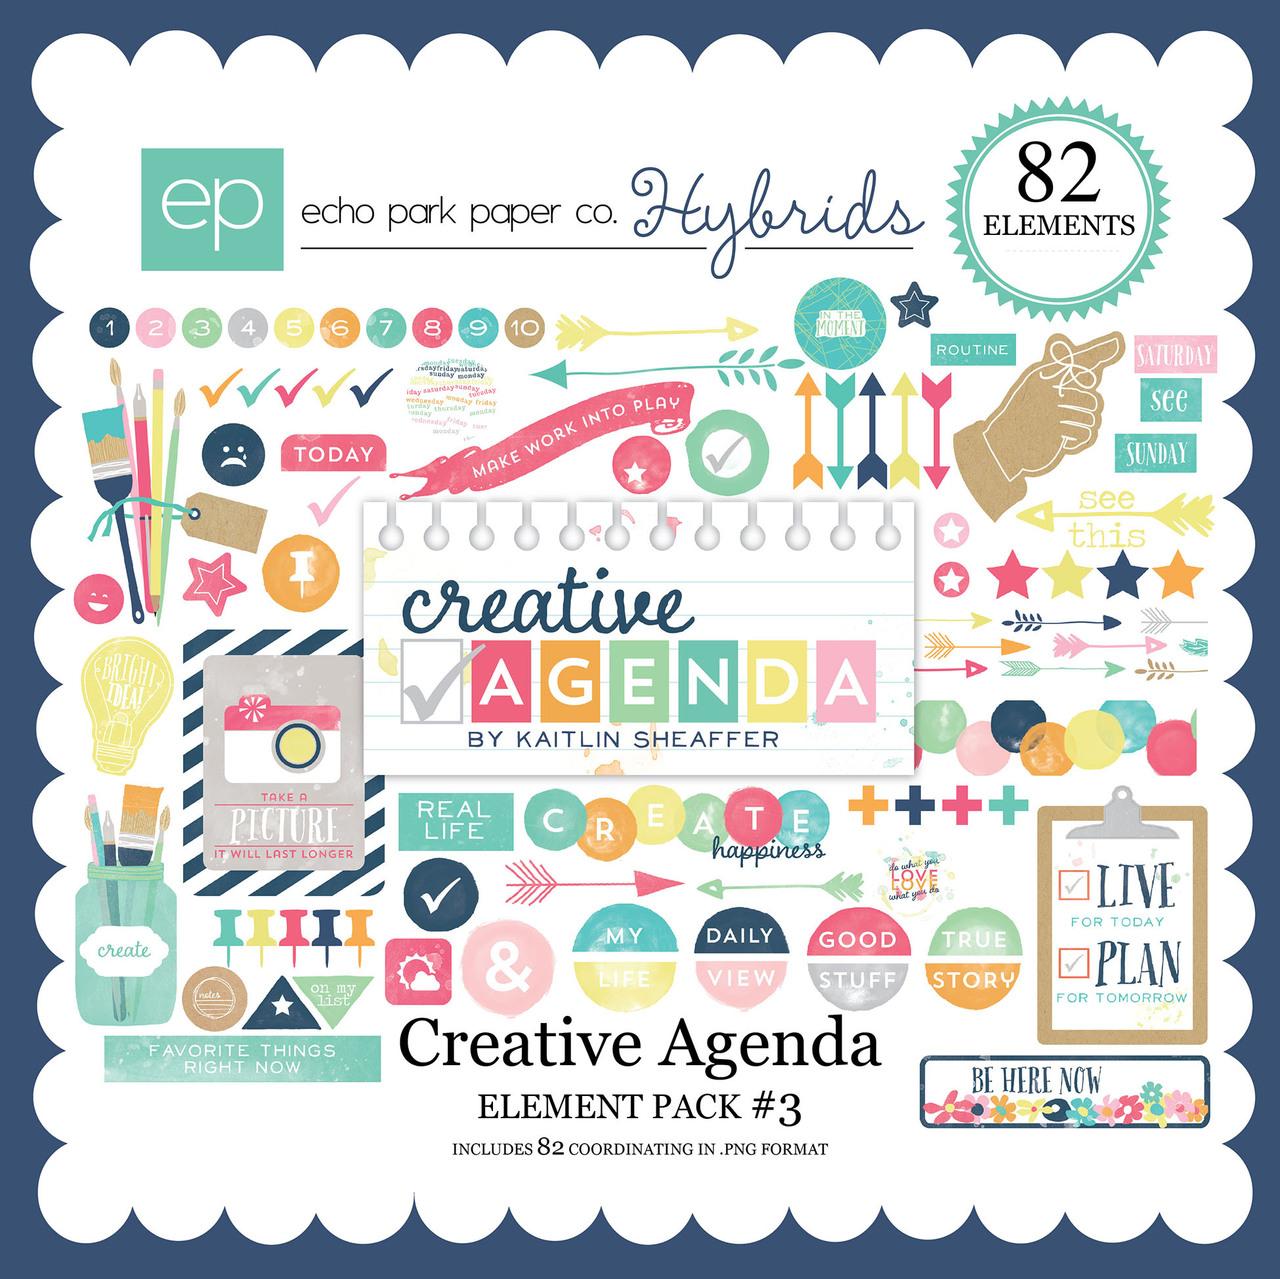 Creative Agenda Element Pack #3